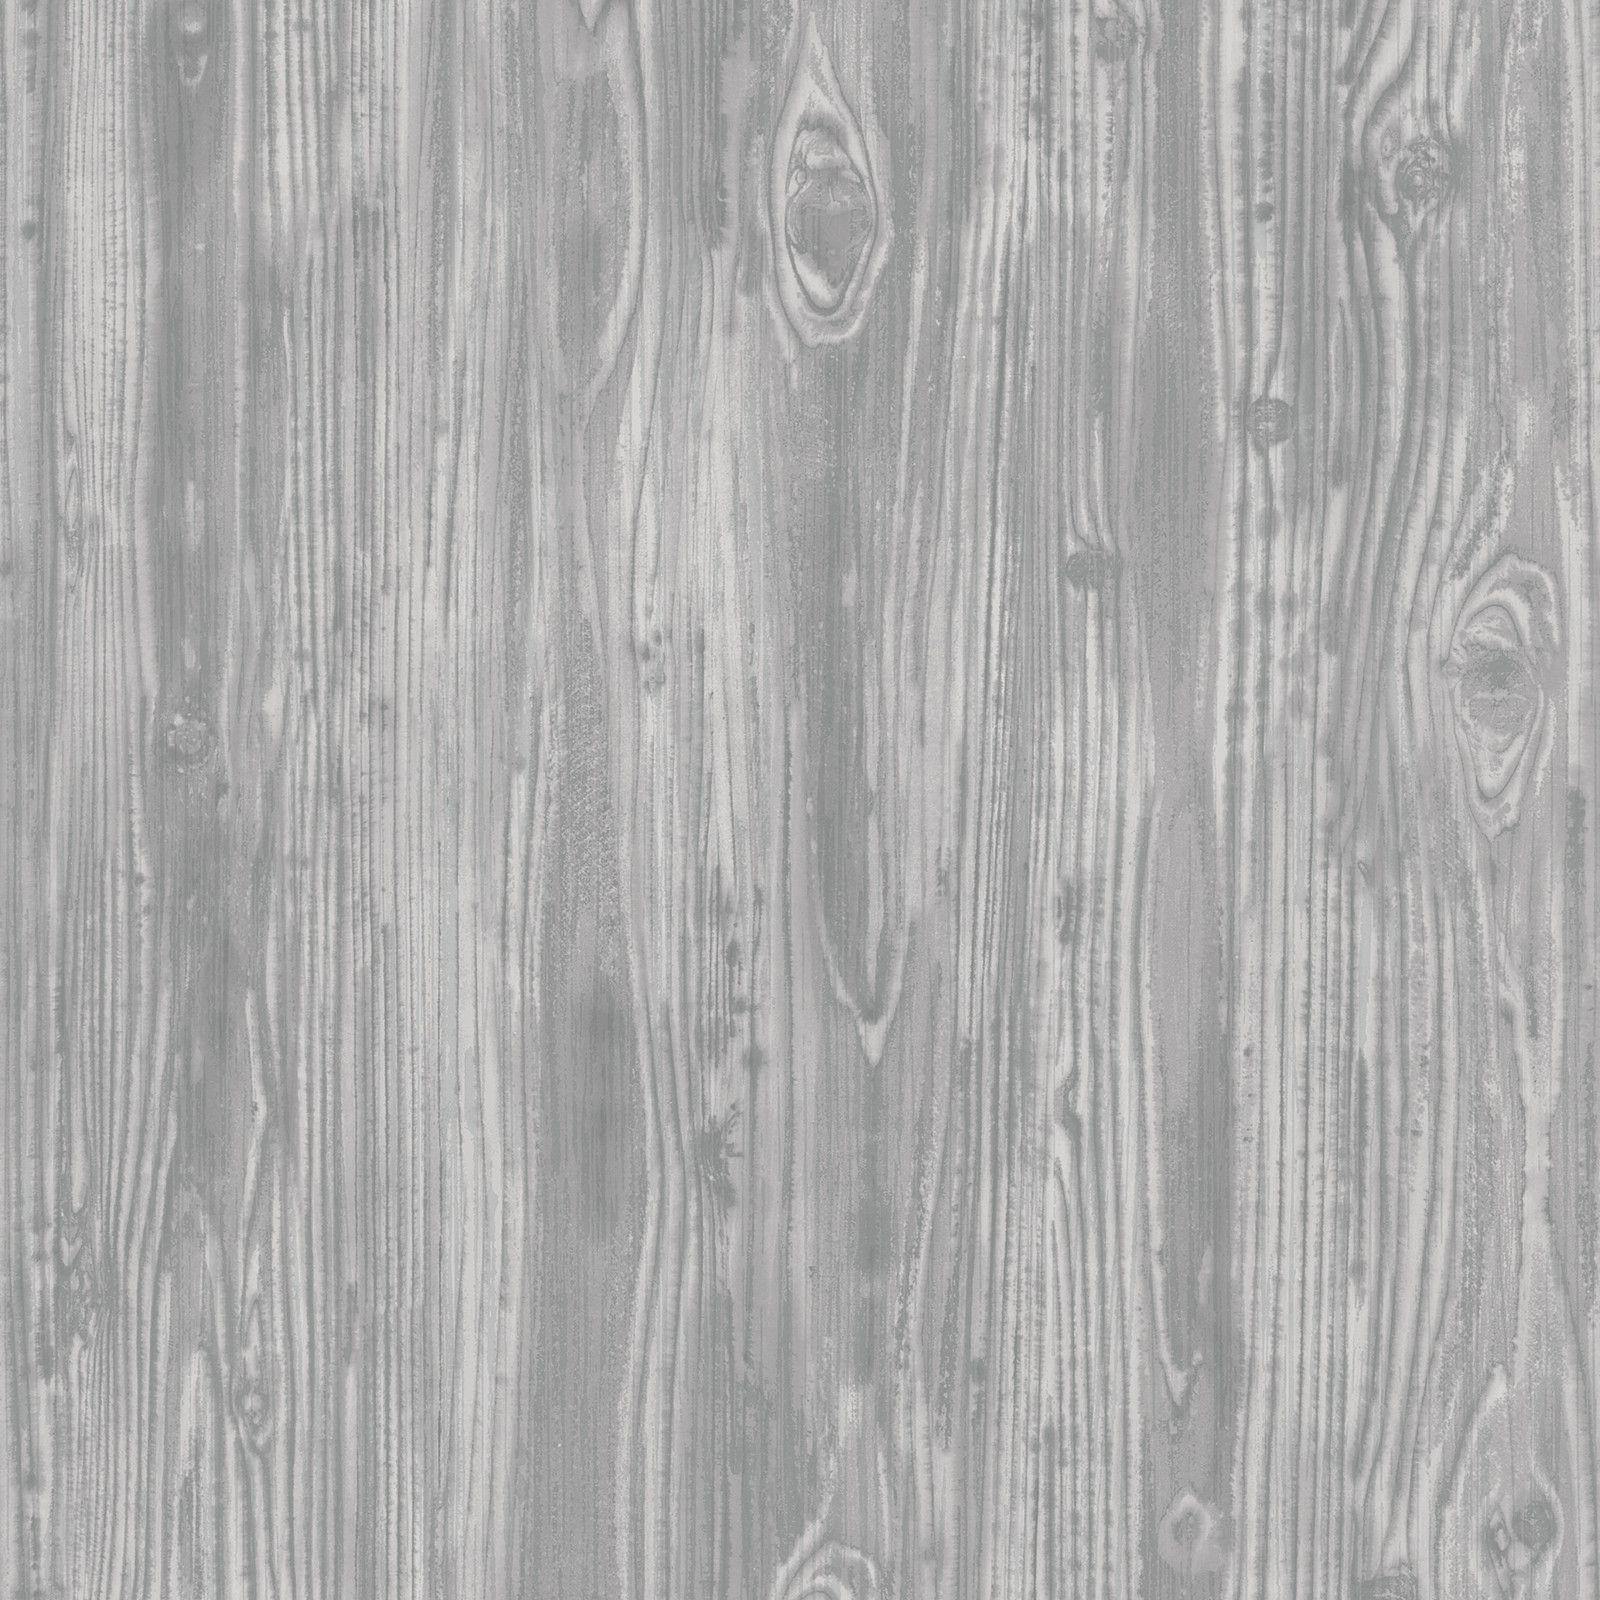 Woodgrain Textured Wallpaper Wood Wallpaper Wood Grain Wallpaper Textured Wallpaper